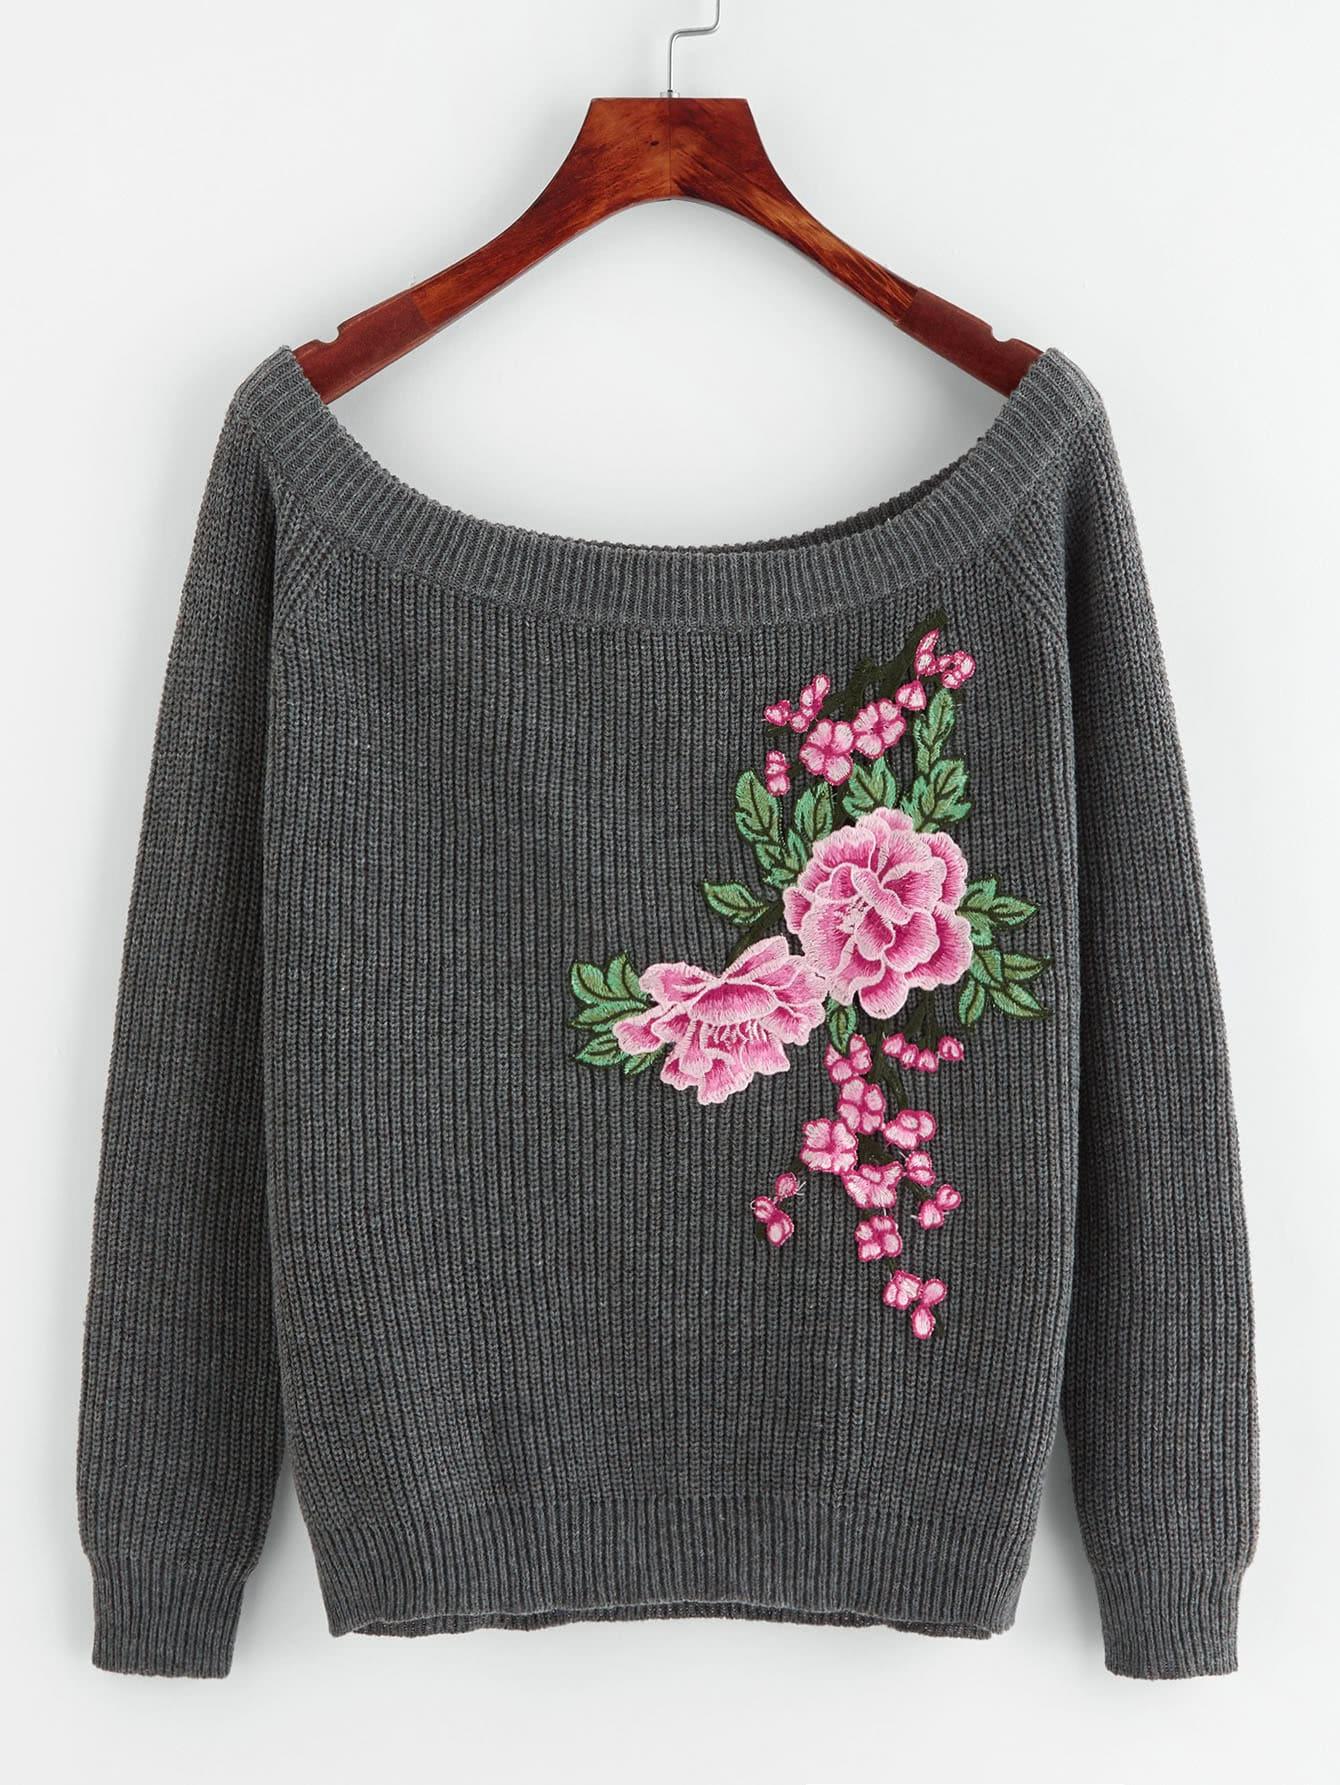 Embroidered Flower Patch Raglan Sleeve Jumper embroidered flower patch jumper